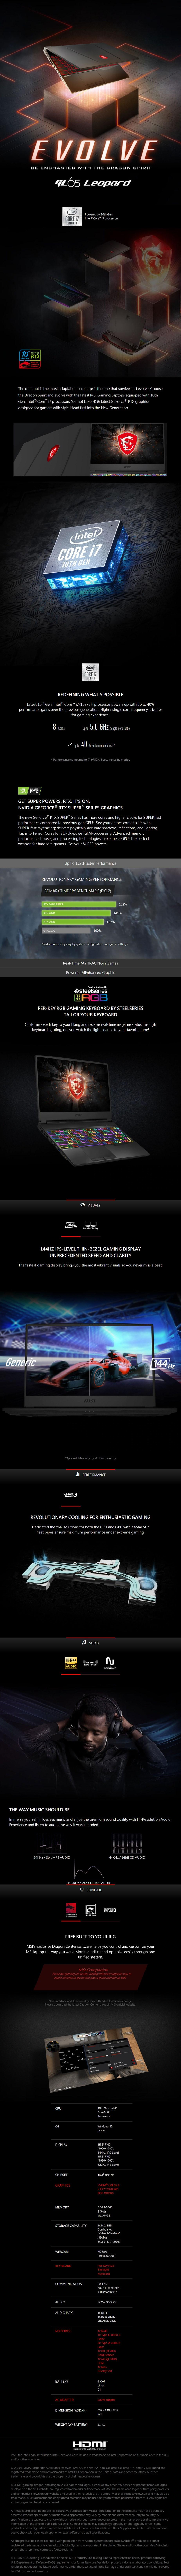 "MSI GL65 Leopard 10SFK 15.6"" 144Hz Gaming Laptop i7 16GB 512GB RTX2070 W10H - Overview 1"